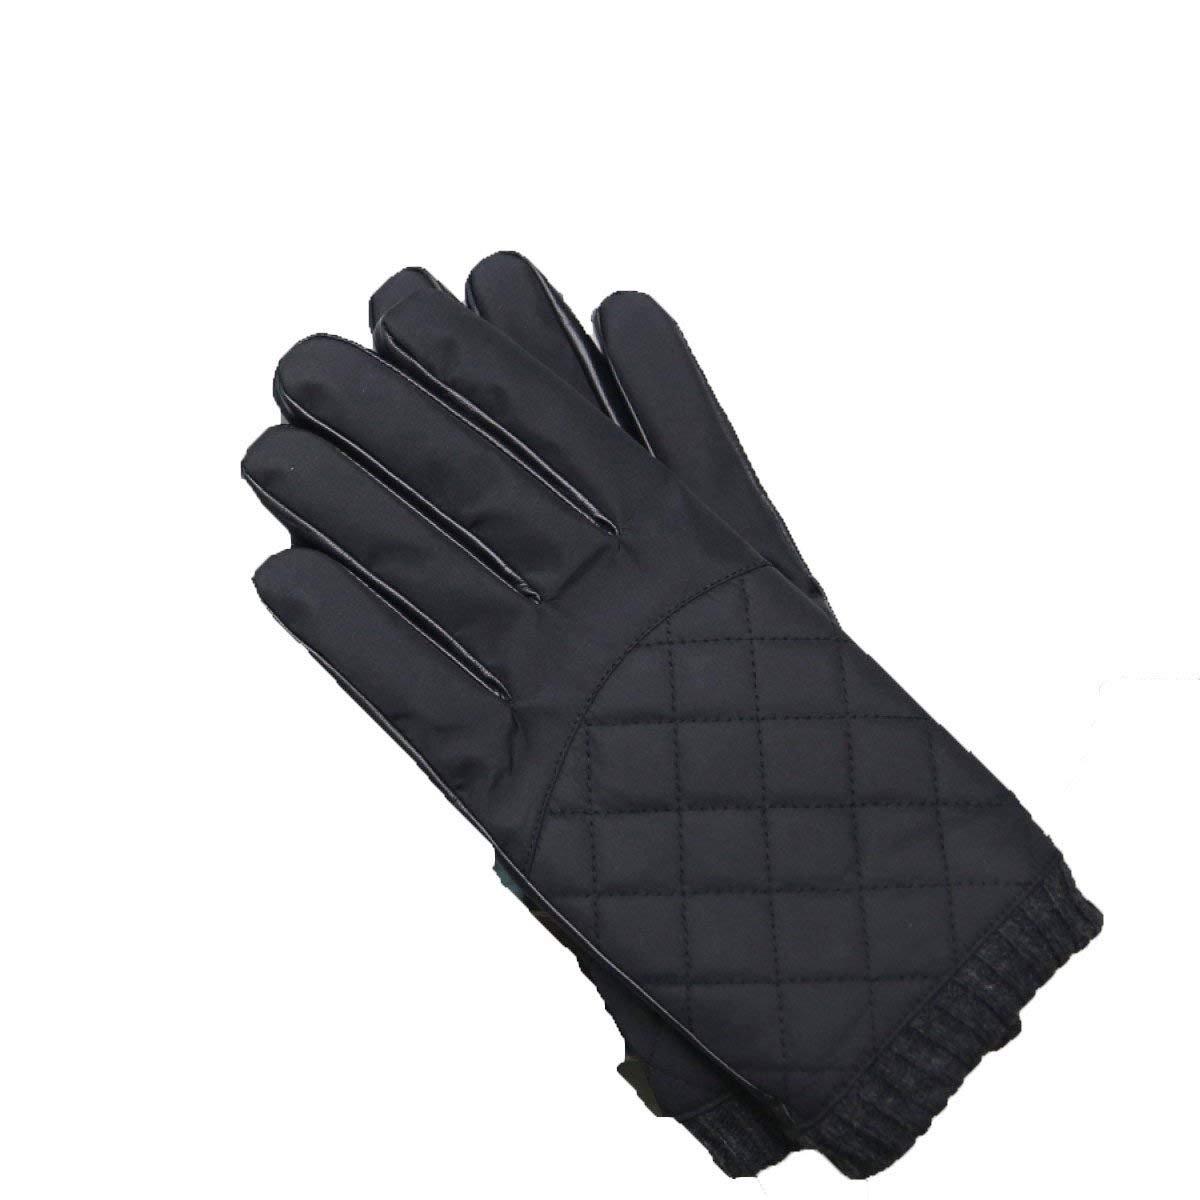 CWJ Men's Autumn and Winter Leather Gloves Driving Short Paragraph Parachute Cloth Rhyme Grid Lattice Cashmere Warm,Black,One Size